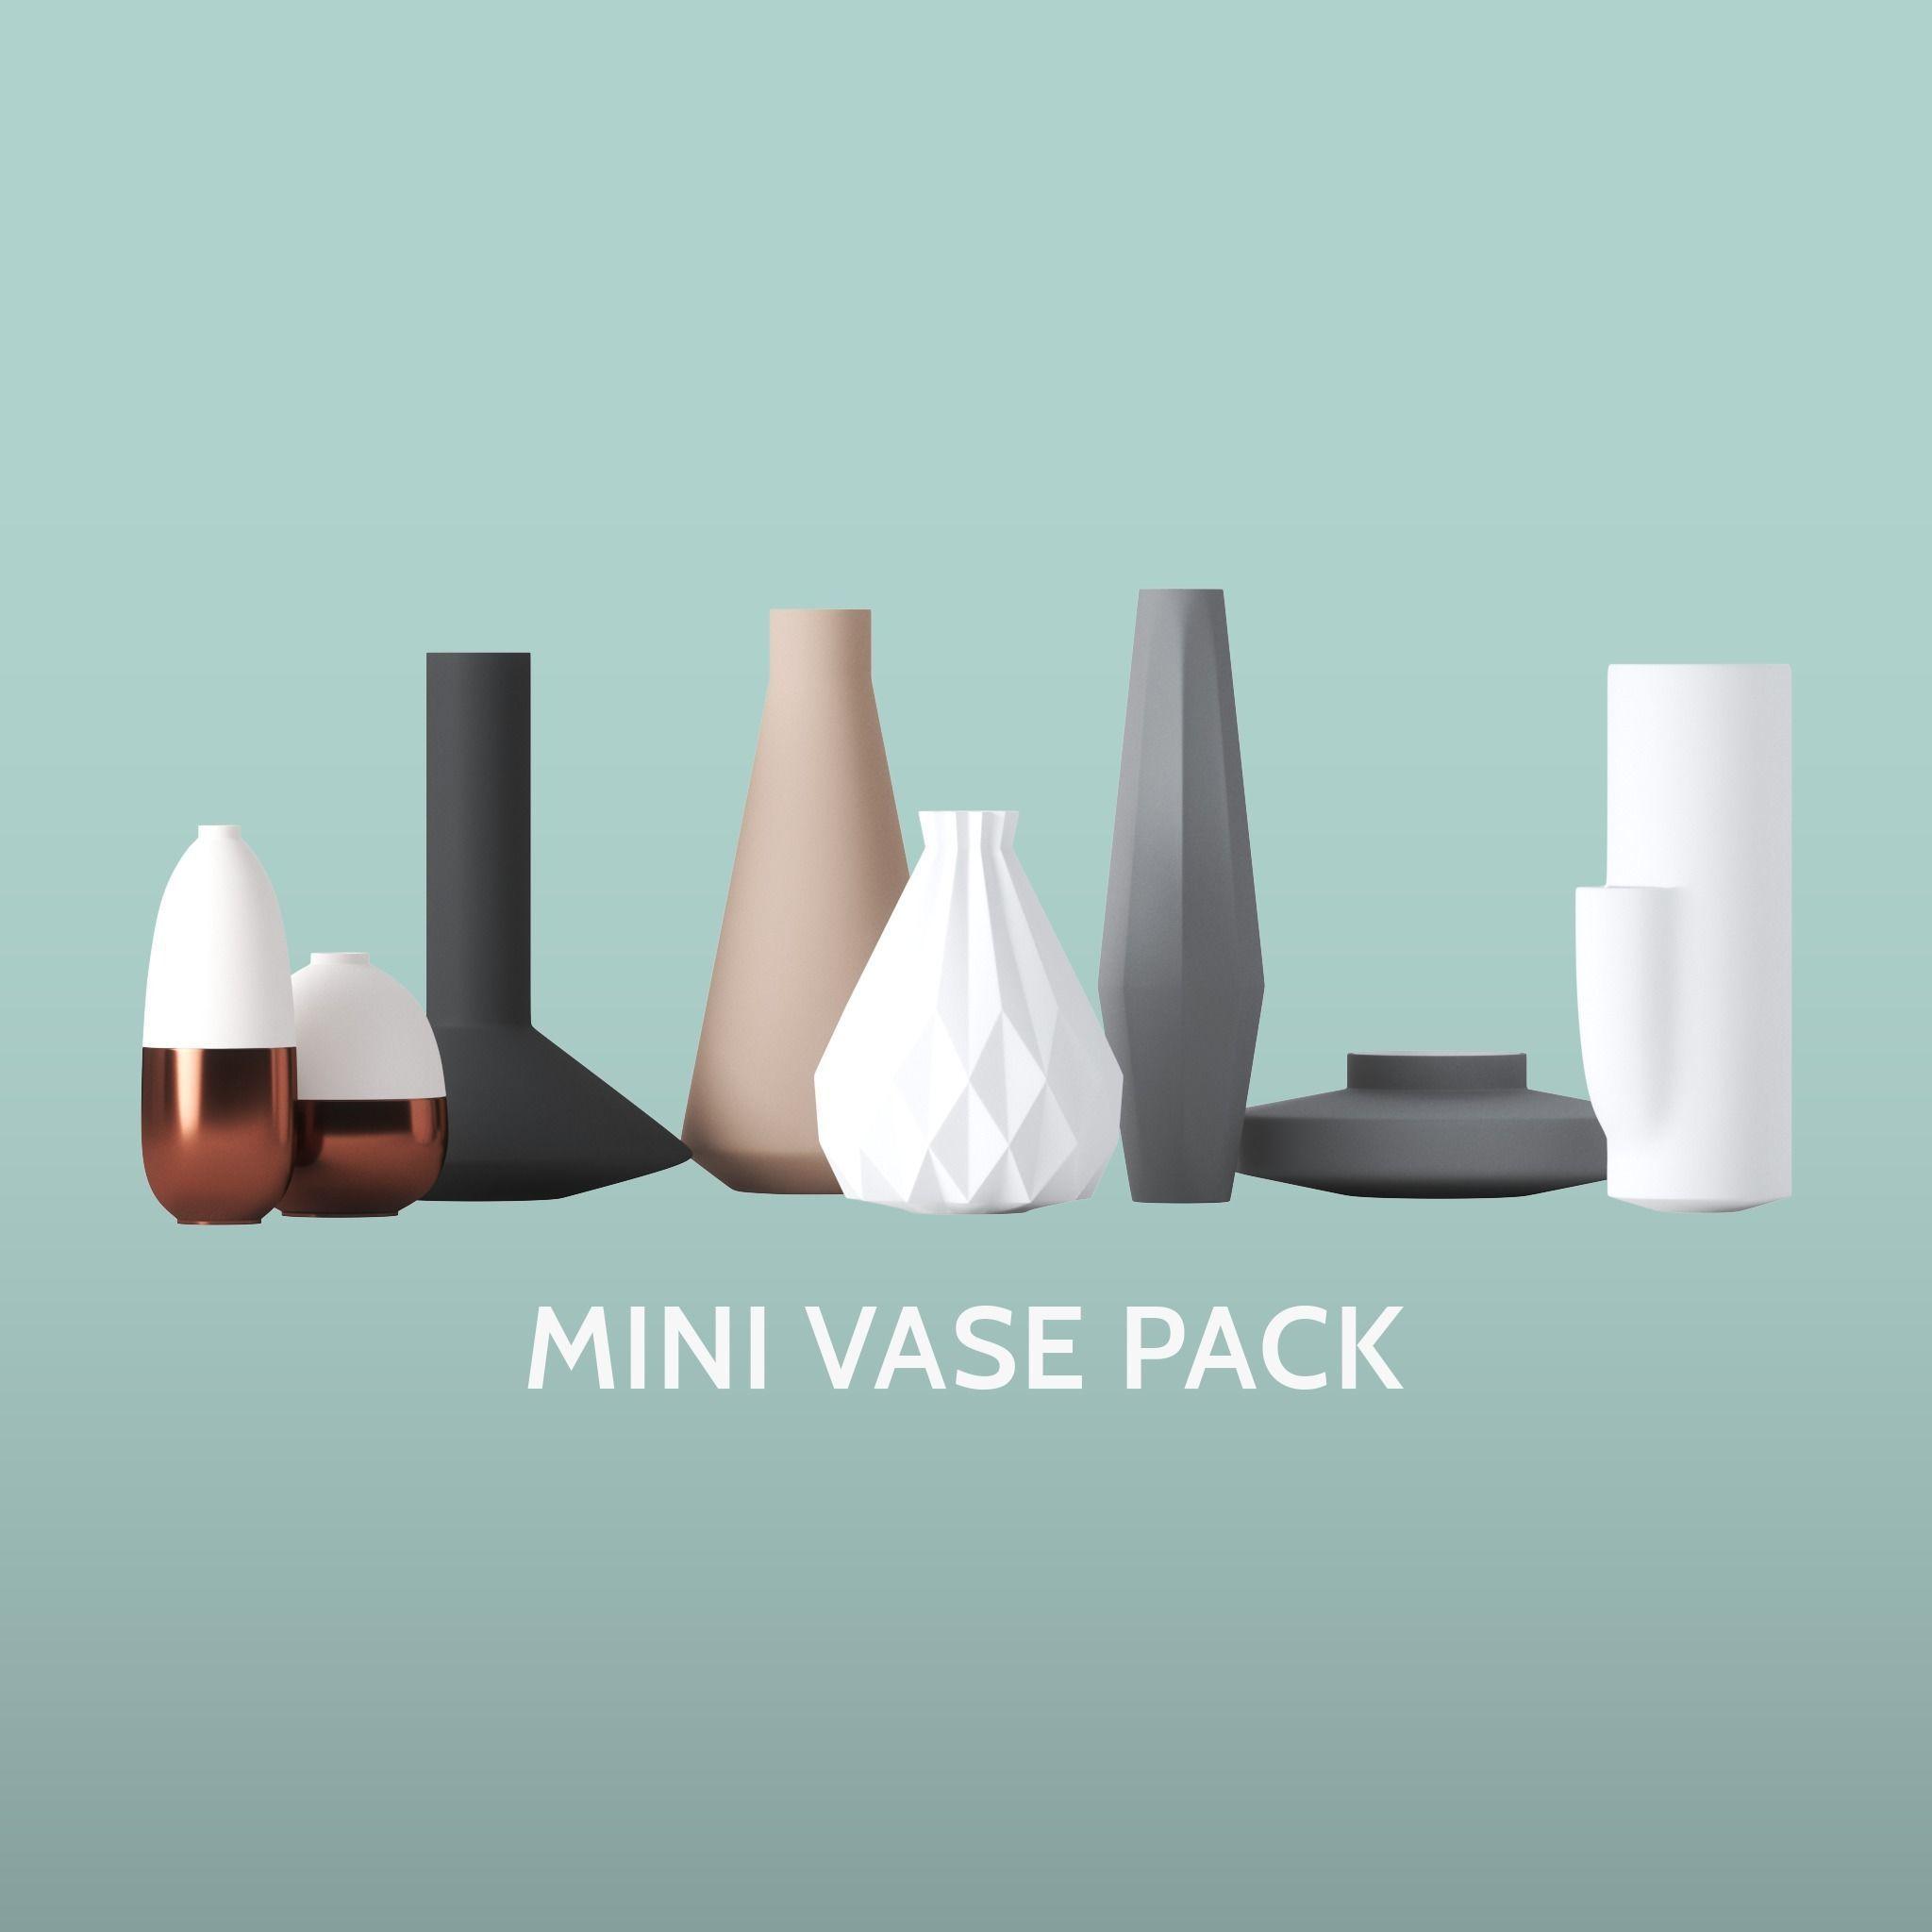 Mini Vase Pack